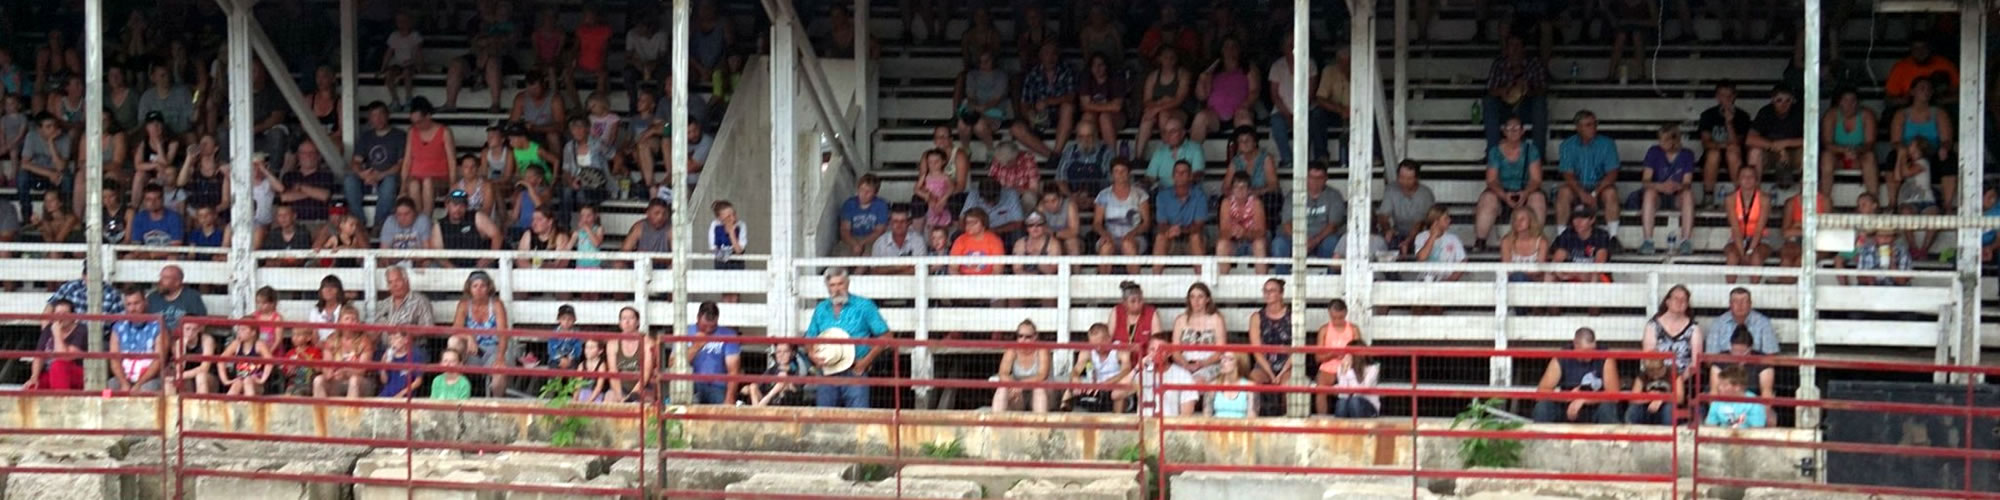 Fillmore County Fair Grandstand Events